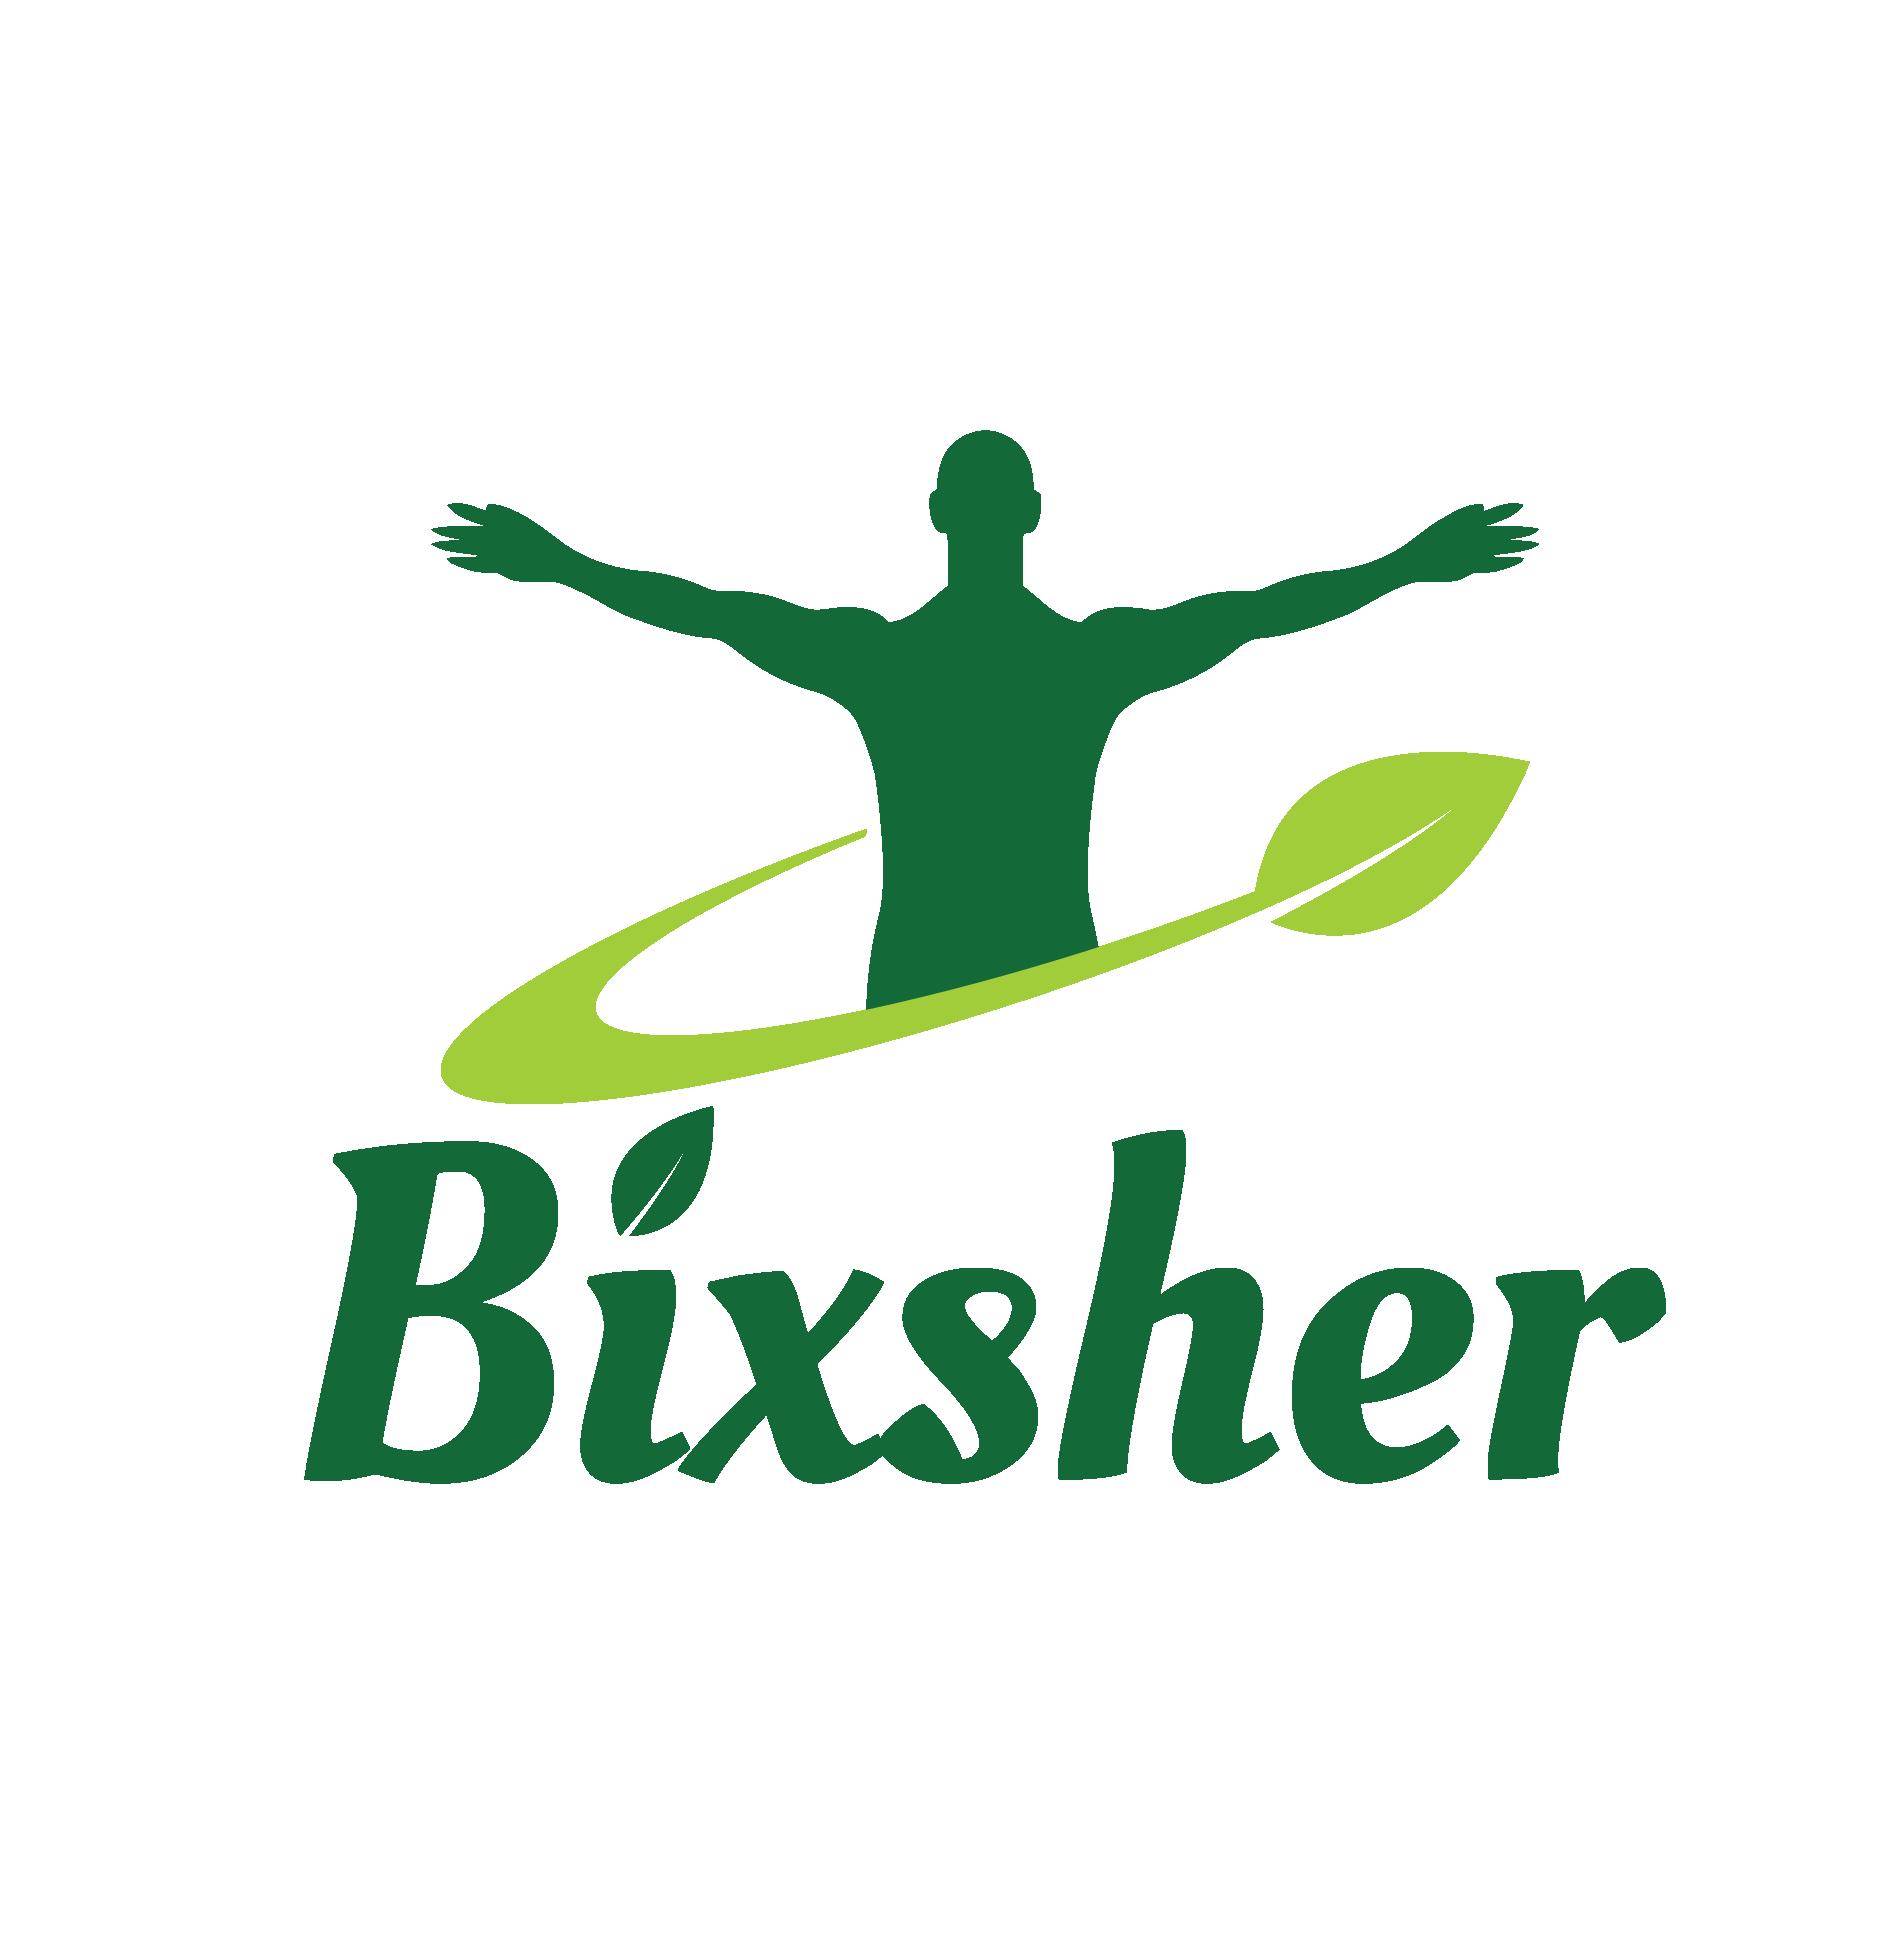 Bixsher UK